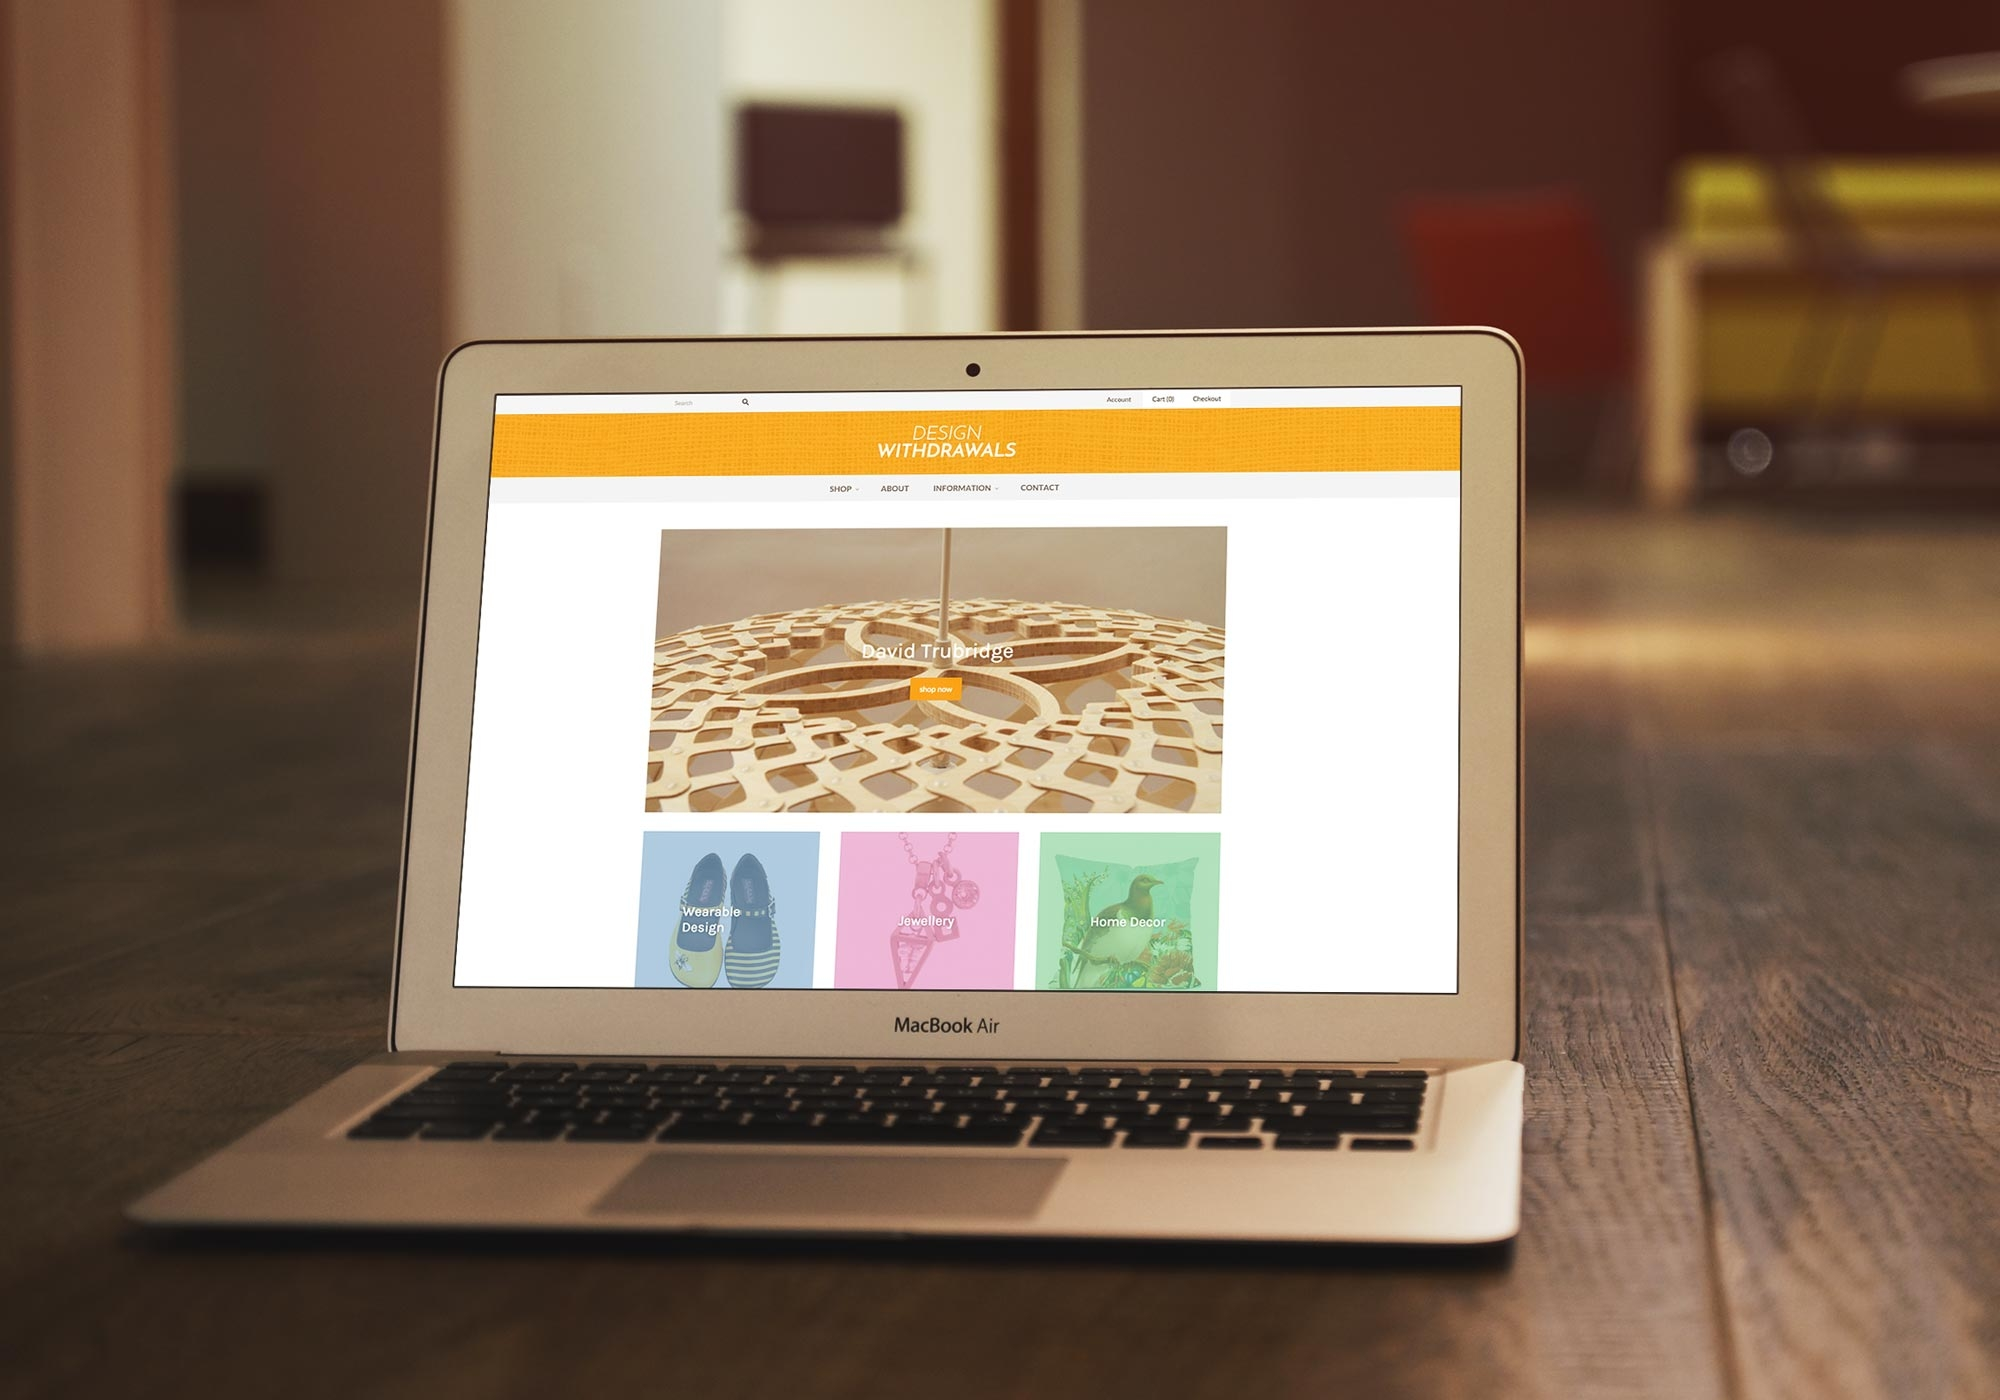 Design Withdrawals Website Feature